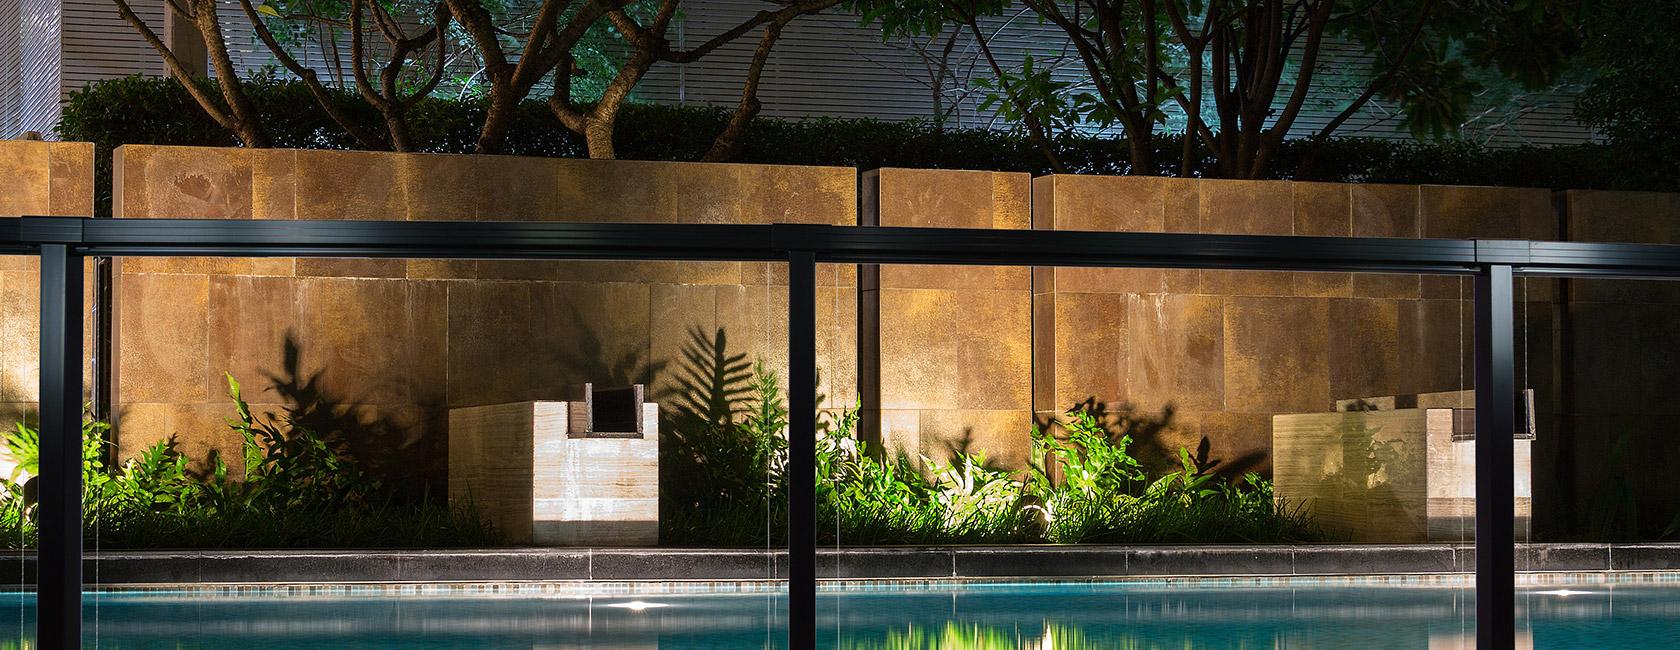 Framed glass deck railing around pool